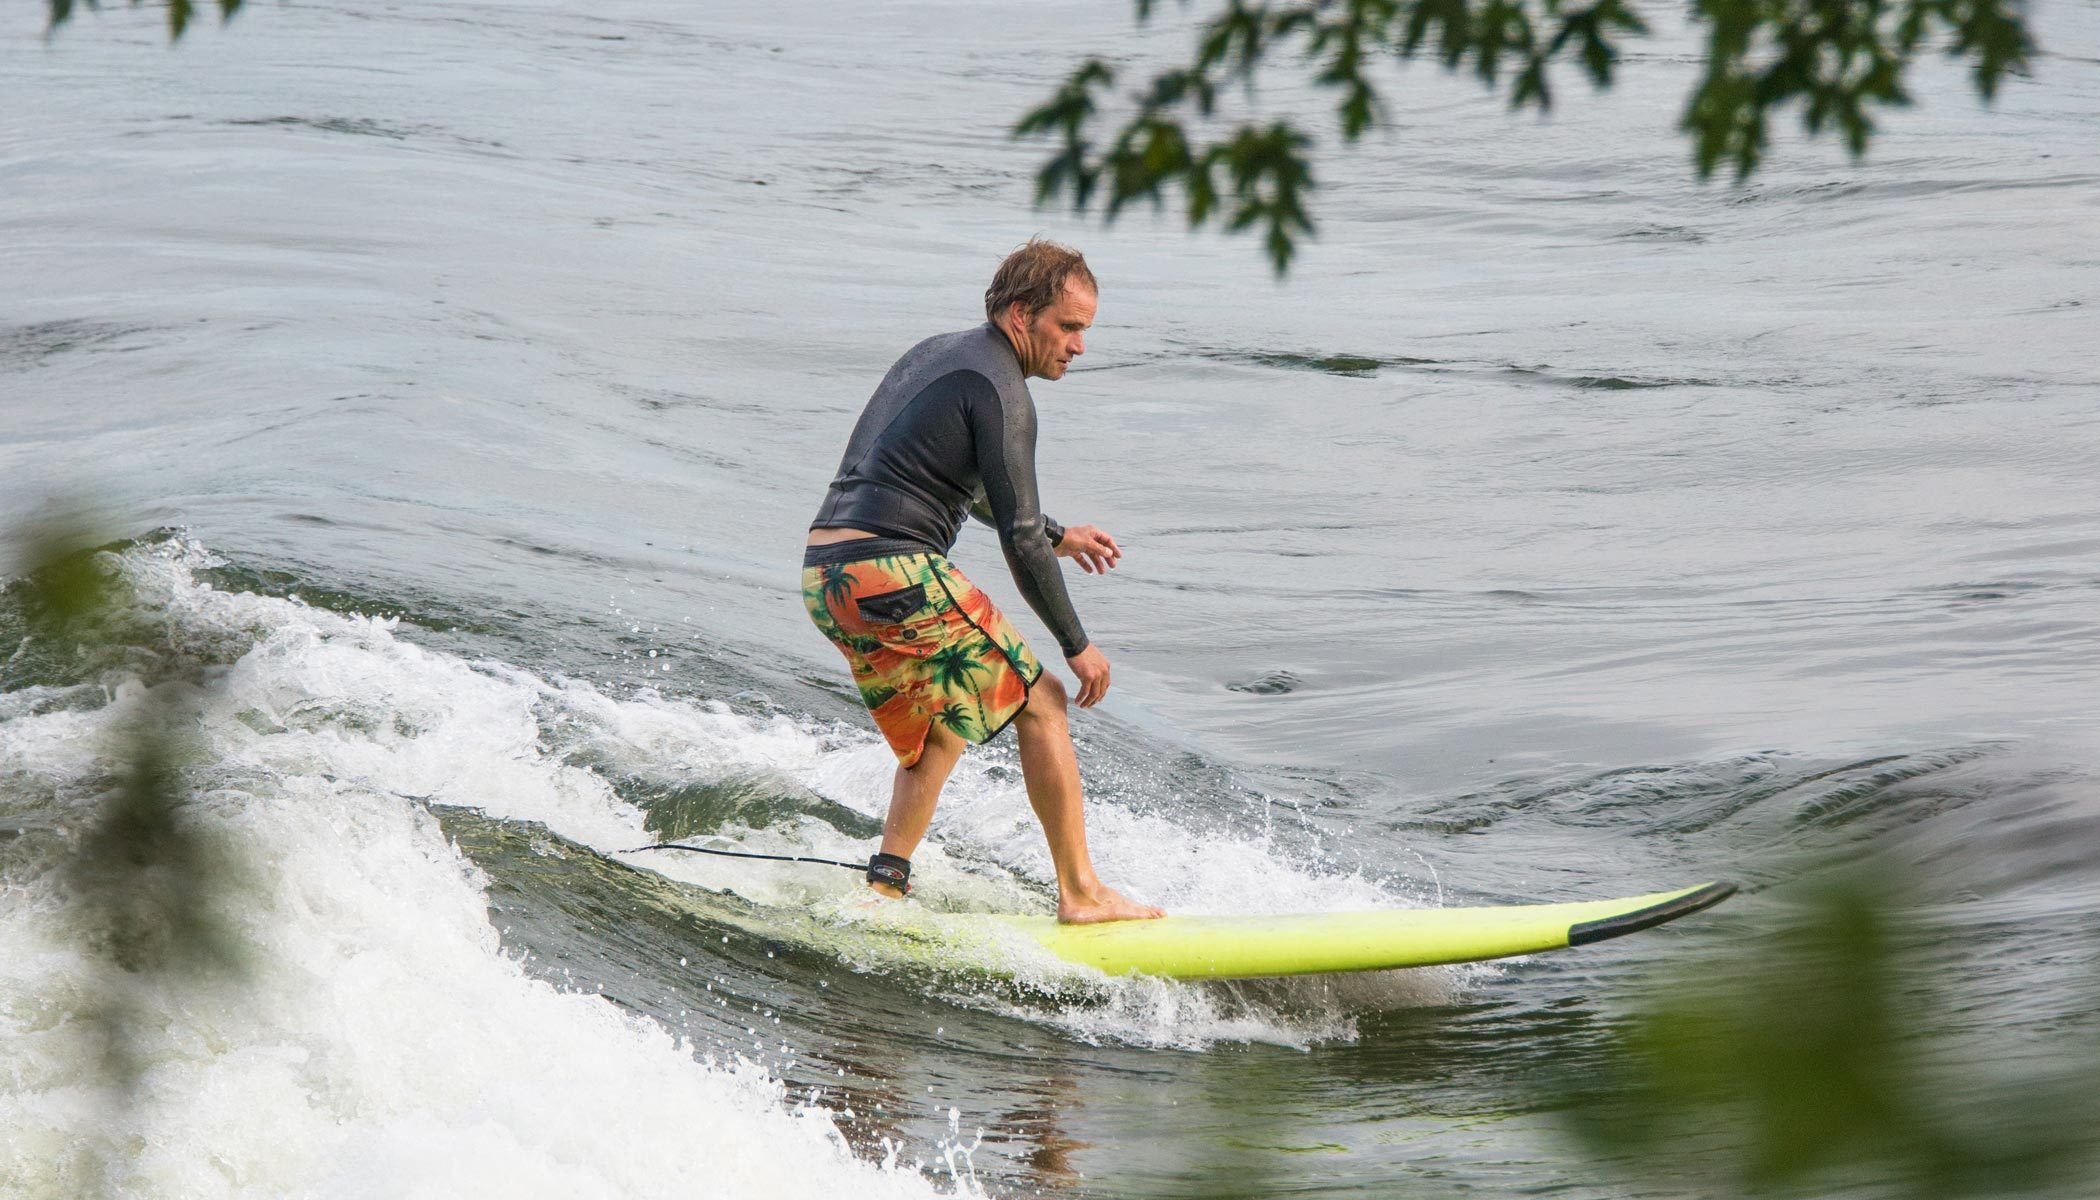 Hugo-Lavictoire-Surf-Guy's-Wave